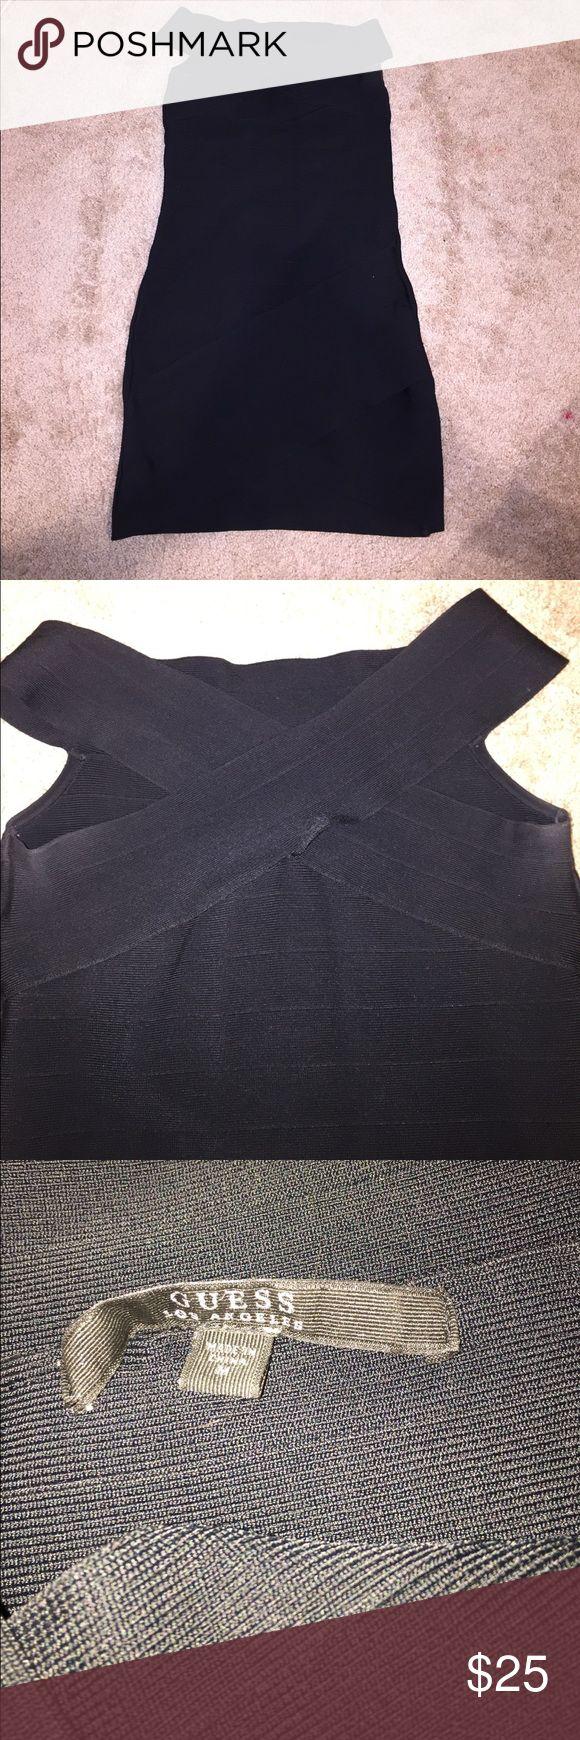 Guess Dress LBD Body con off the shoulder guess dress Guess Dresses Mini